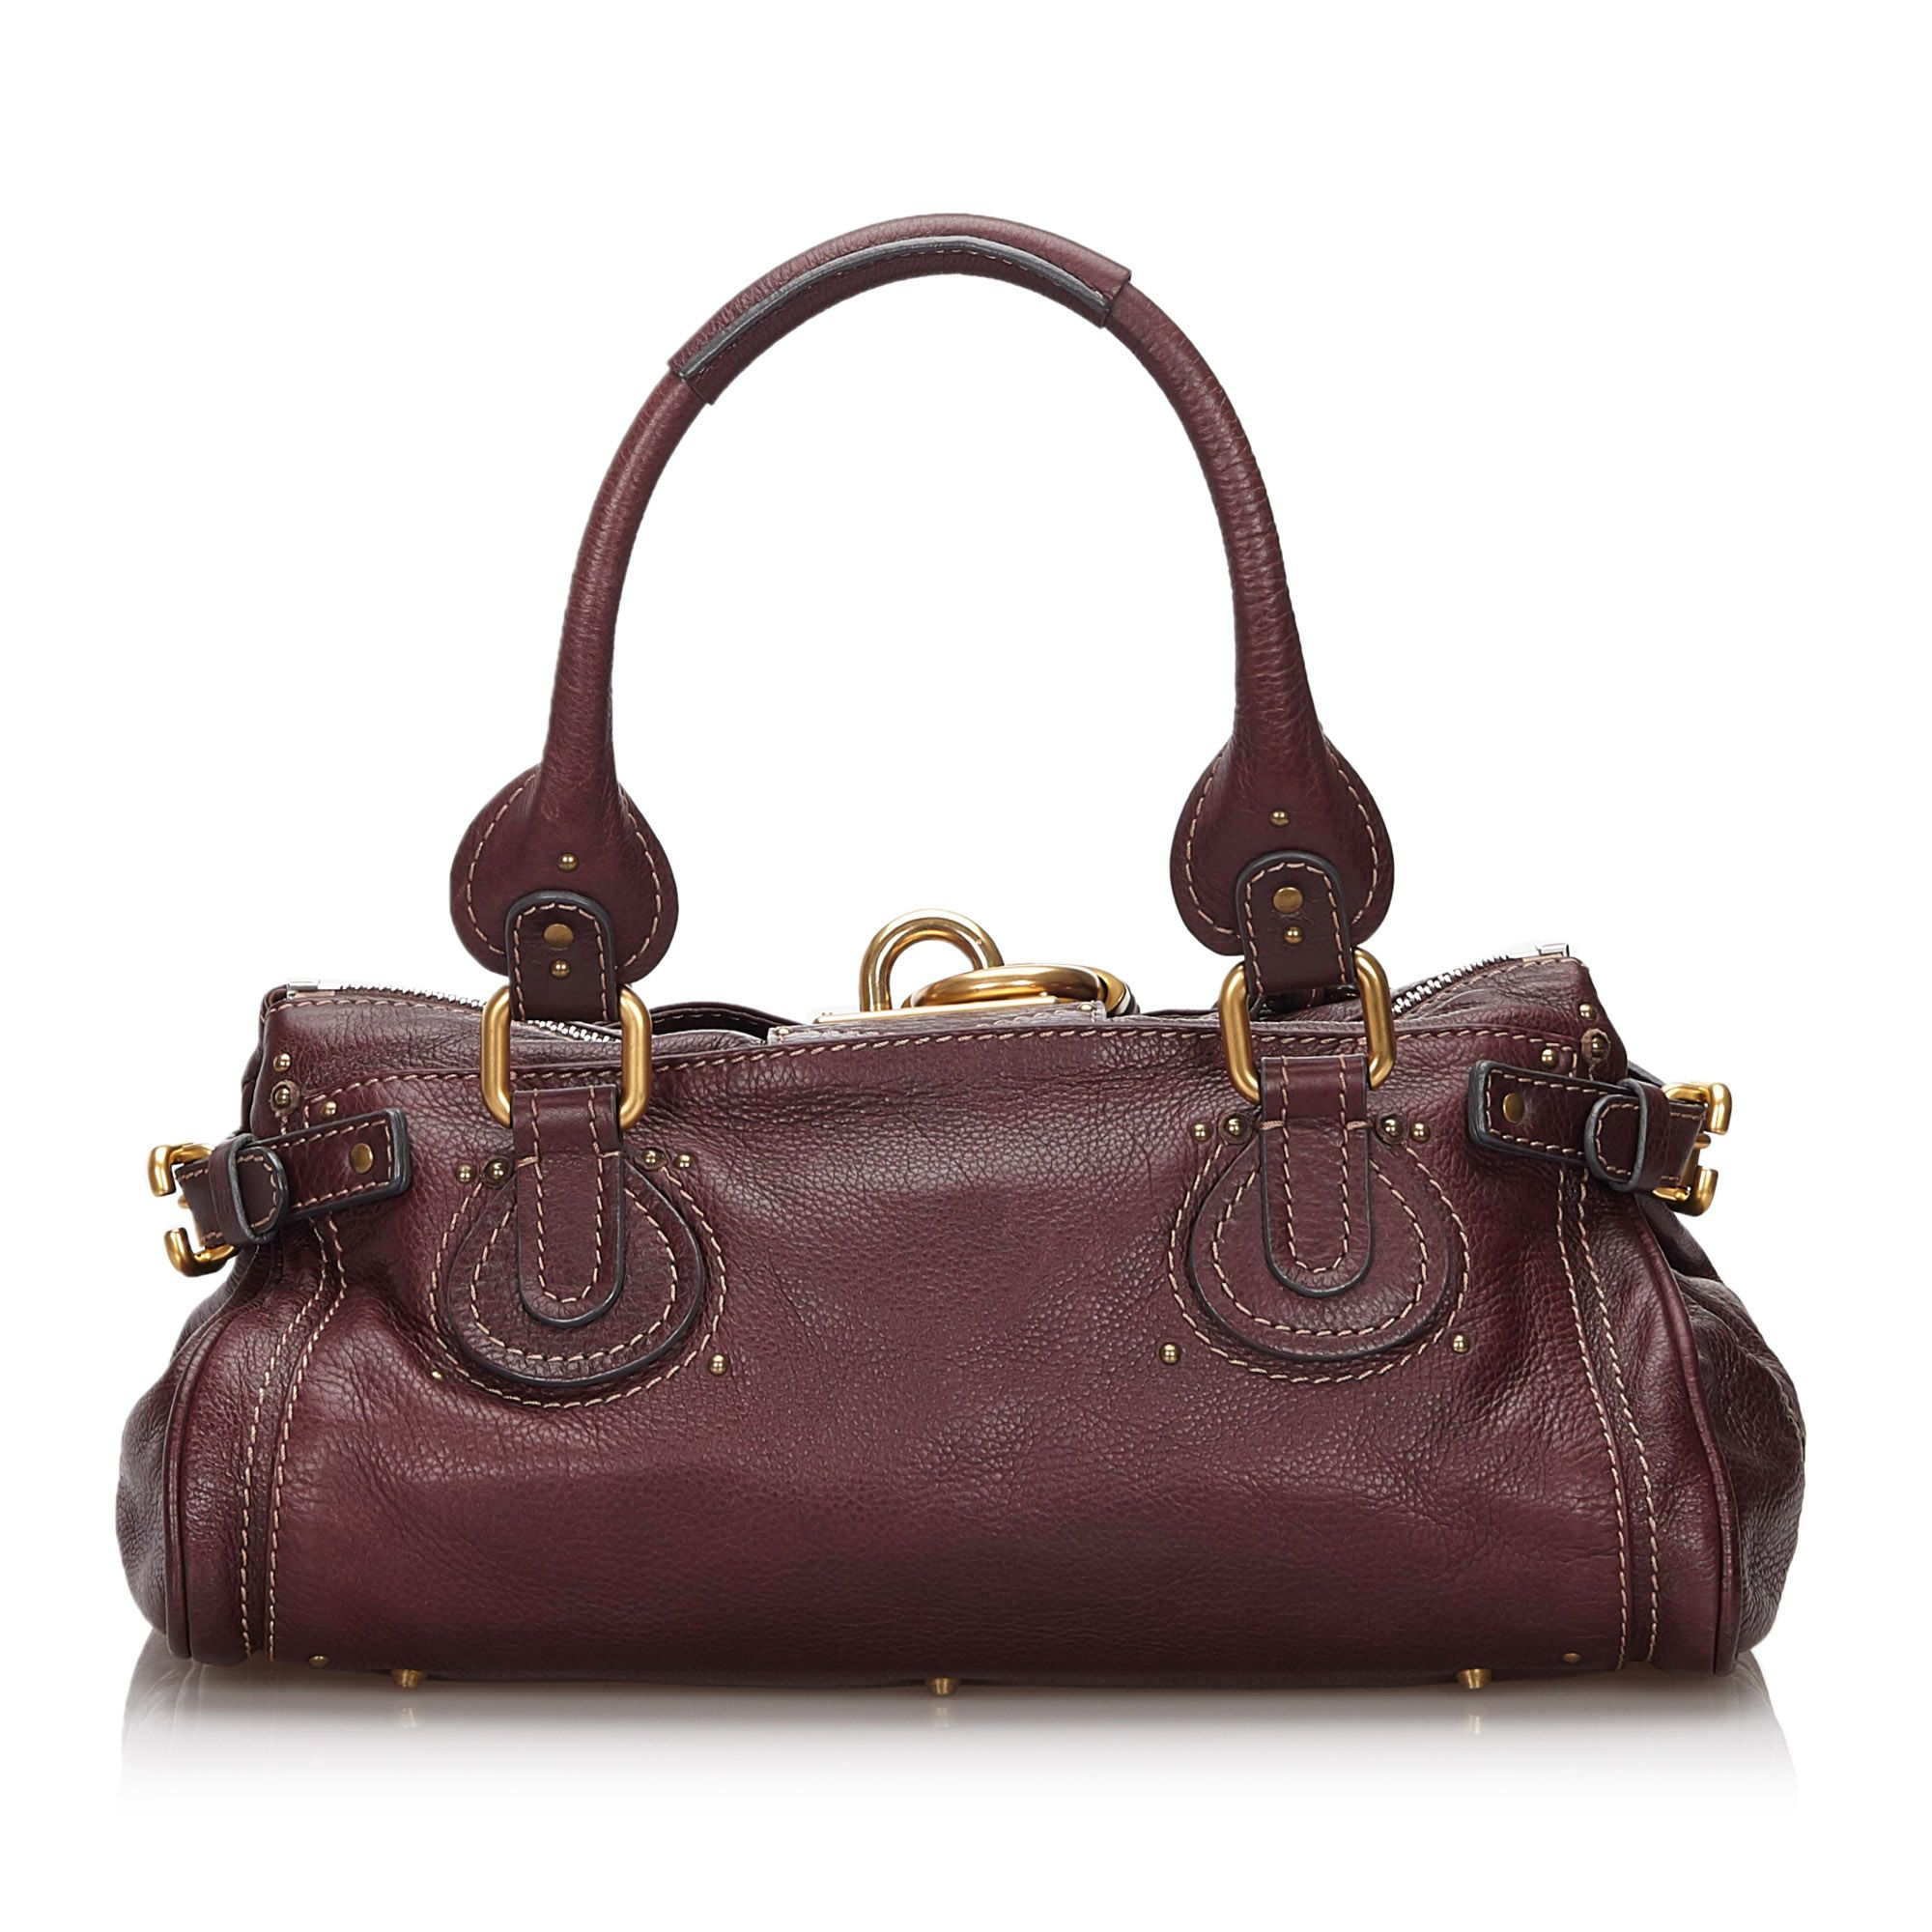 Vintage Chloe Leather Paddington Handbag Red